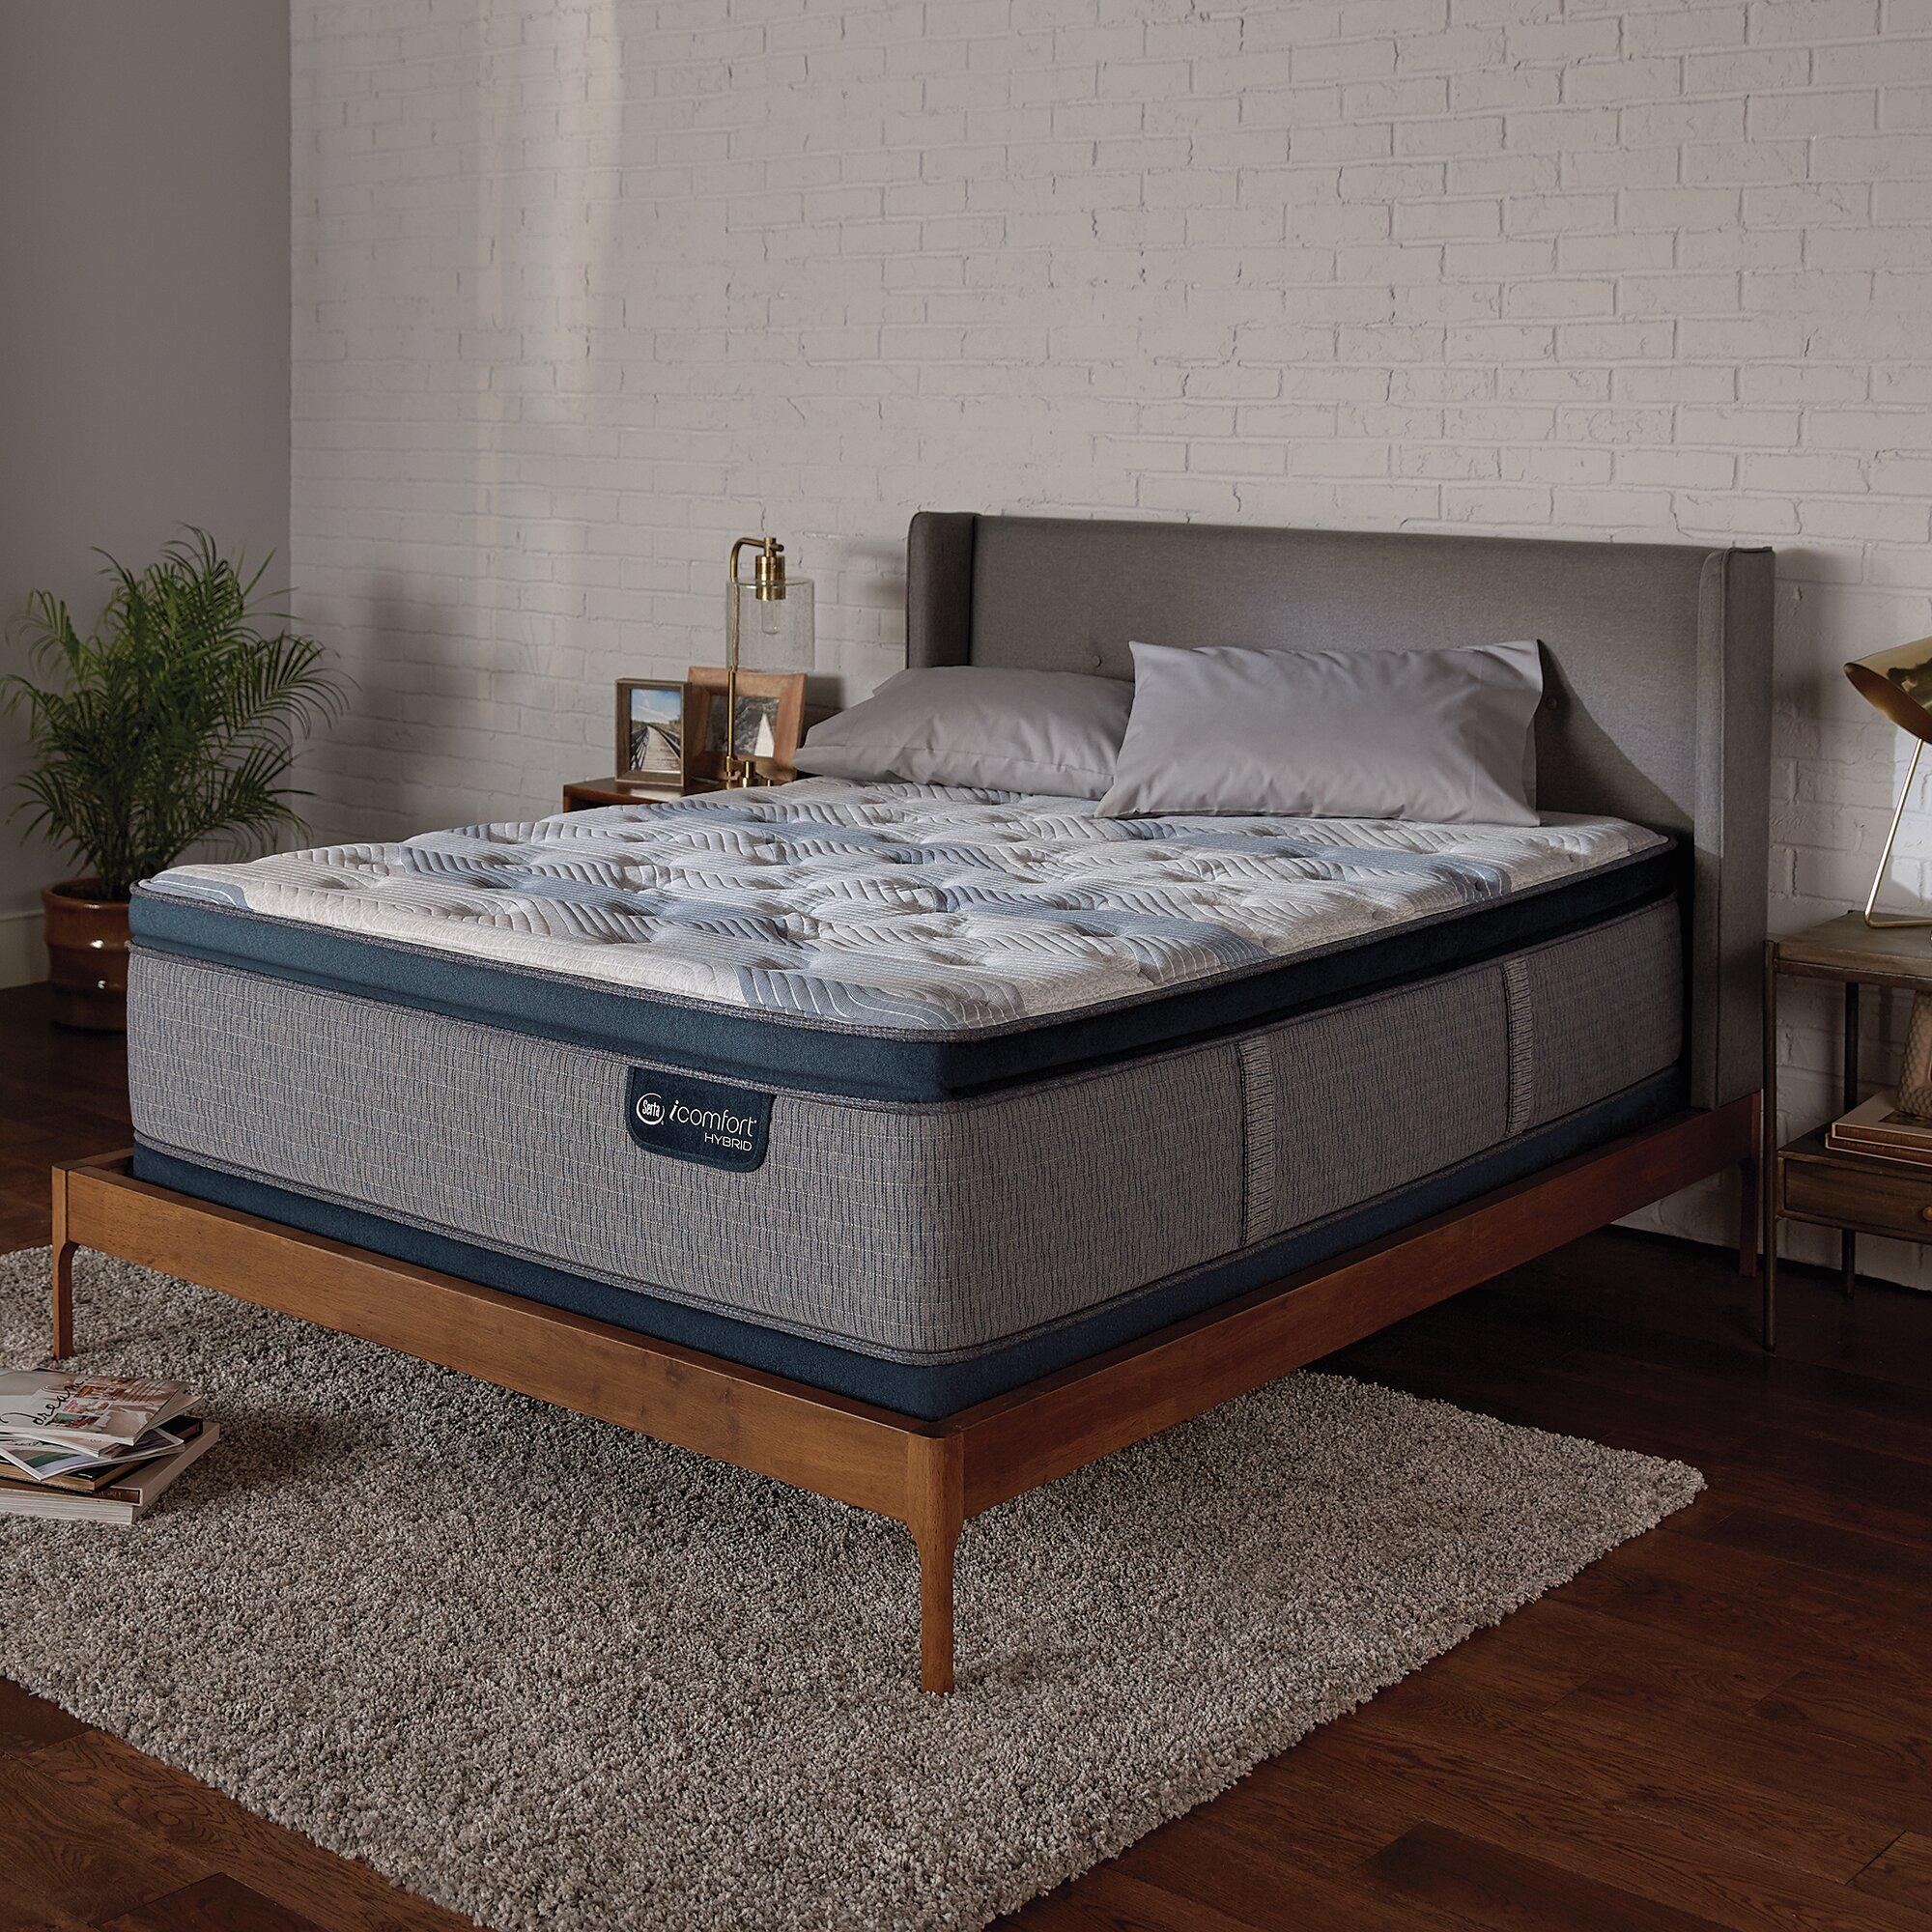 Serta Icomfort 14 Plush Pillow Top Hybrid Mattress And Box Spring Reviews Wayfair